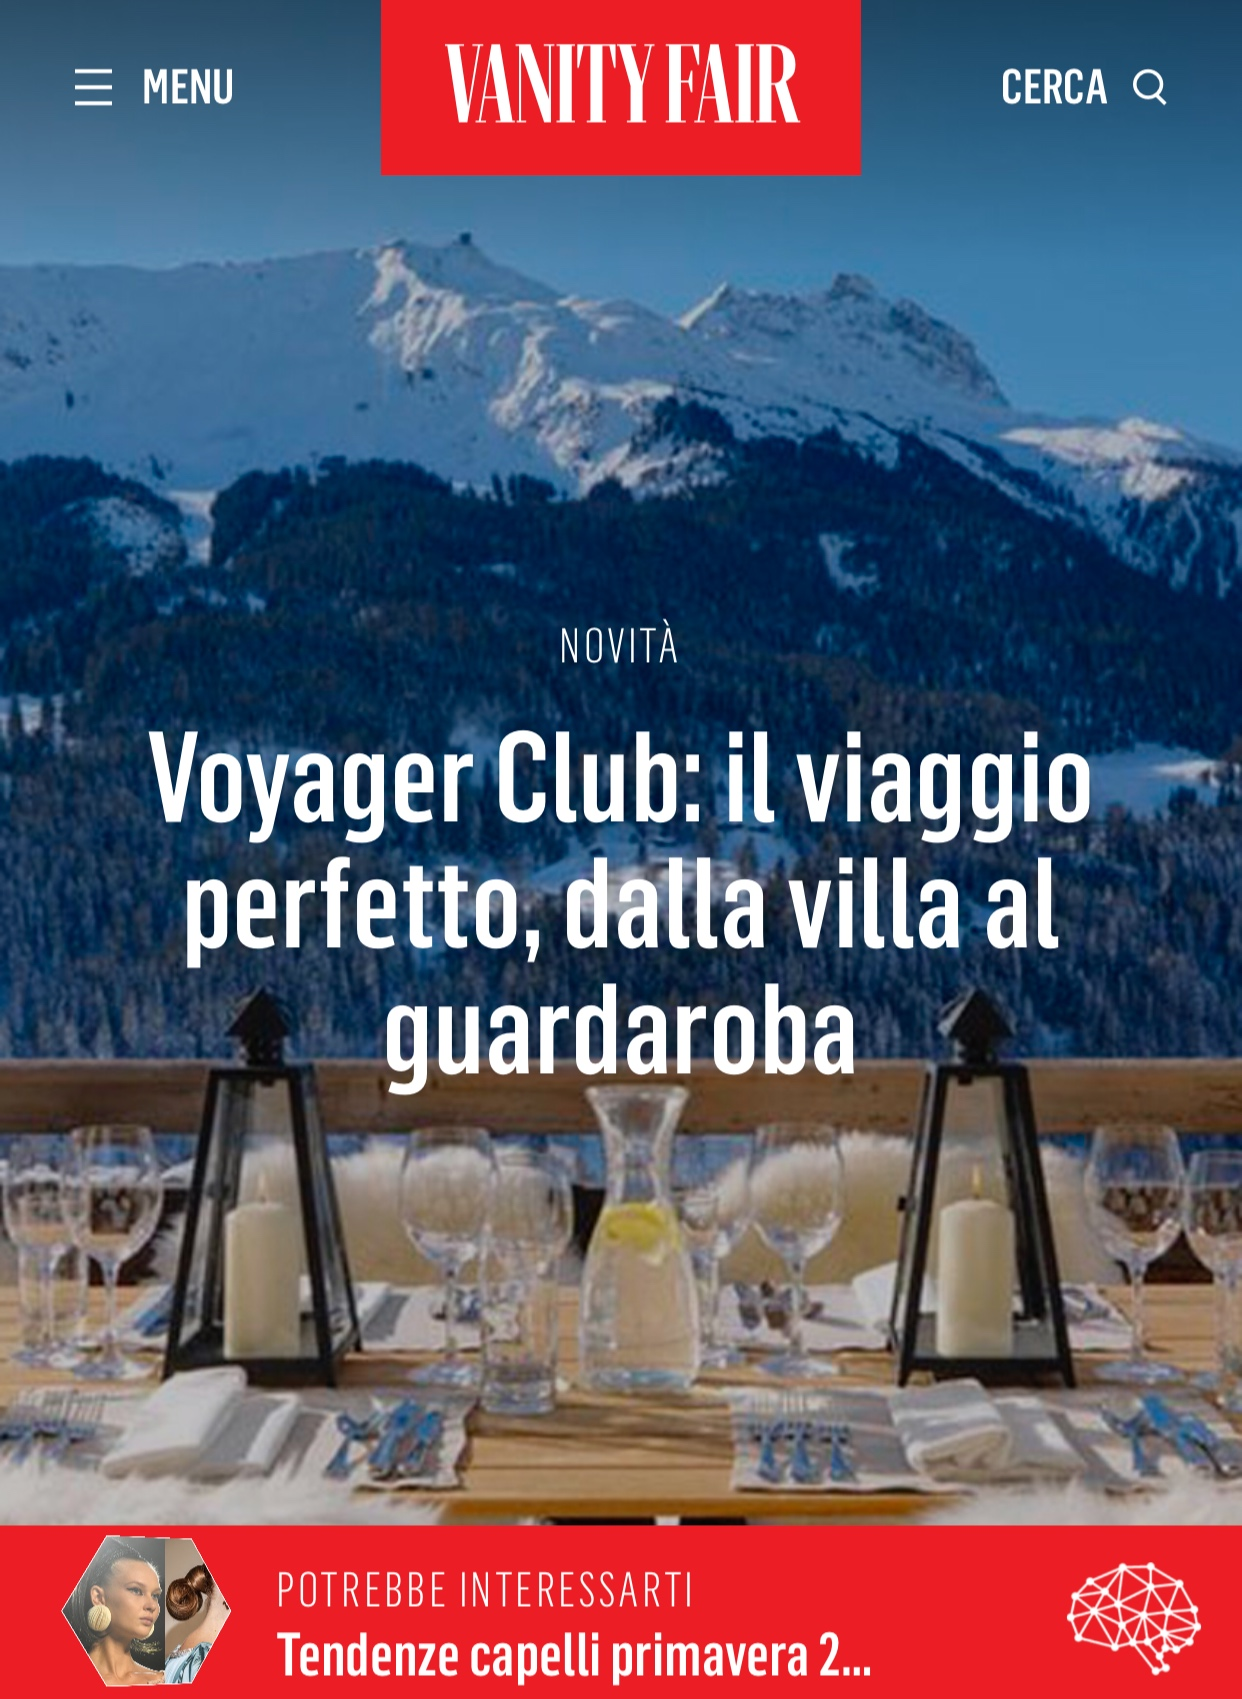 Vanity Fair Italia- Press- Voyager Club